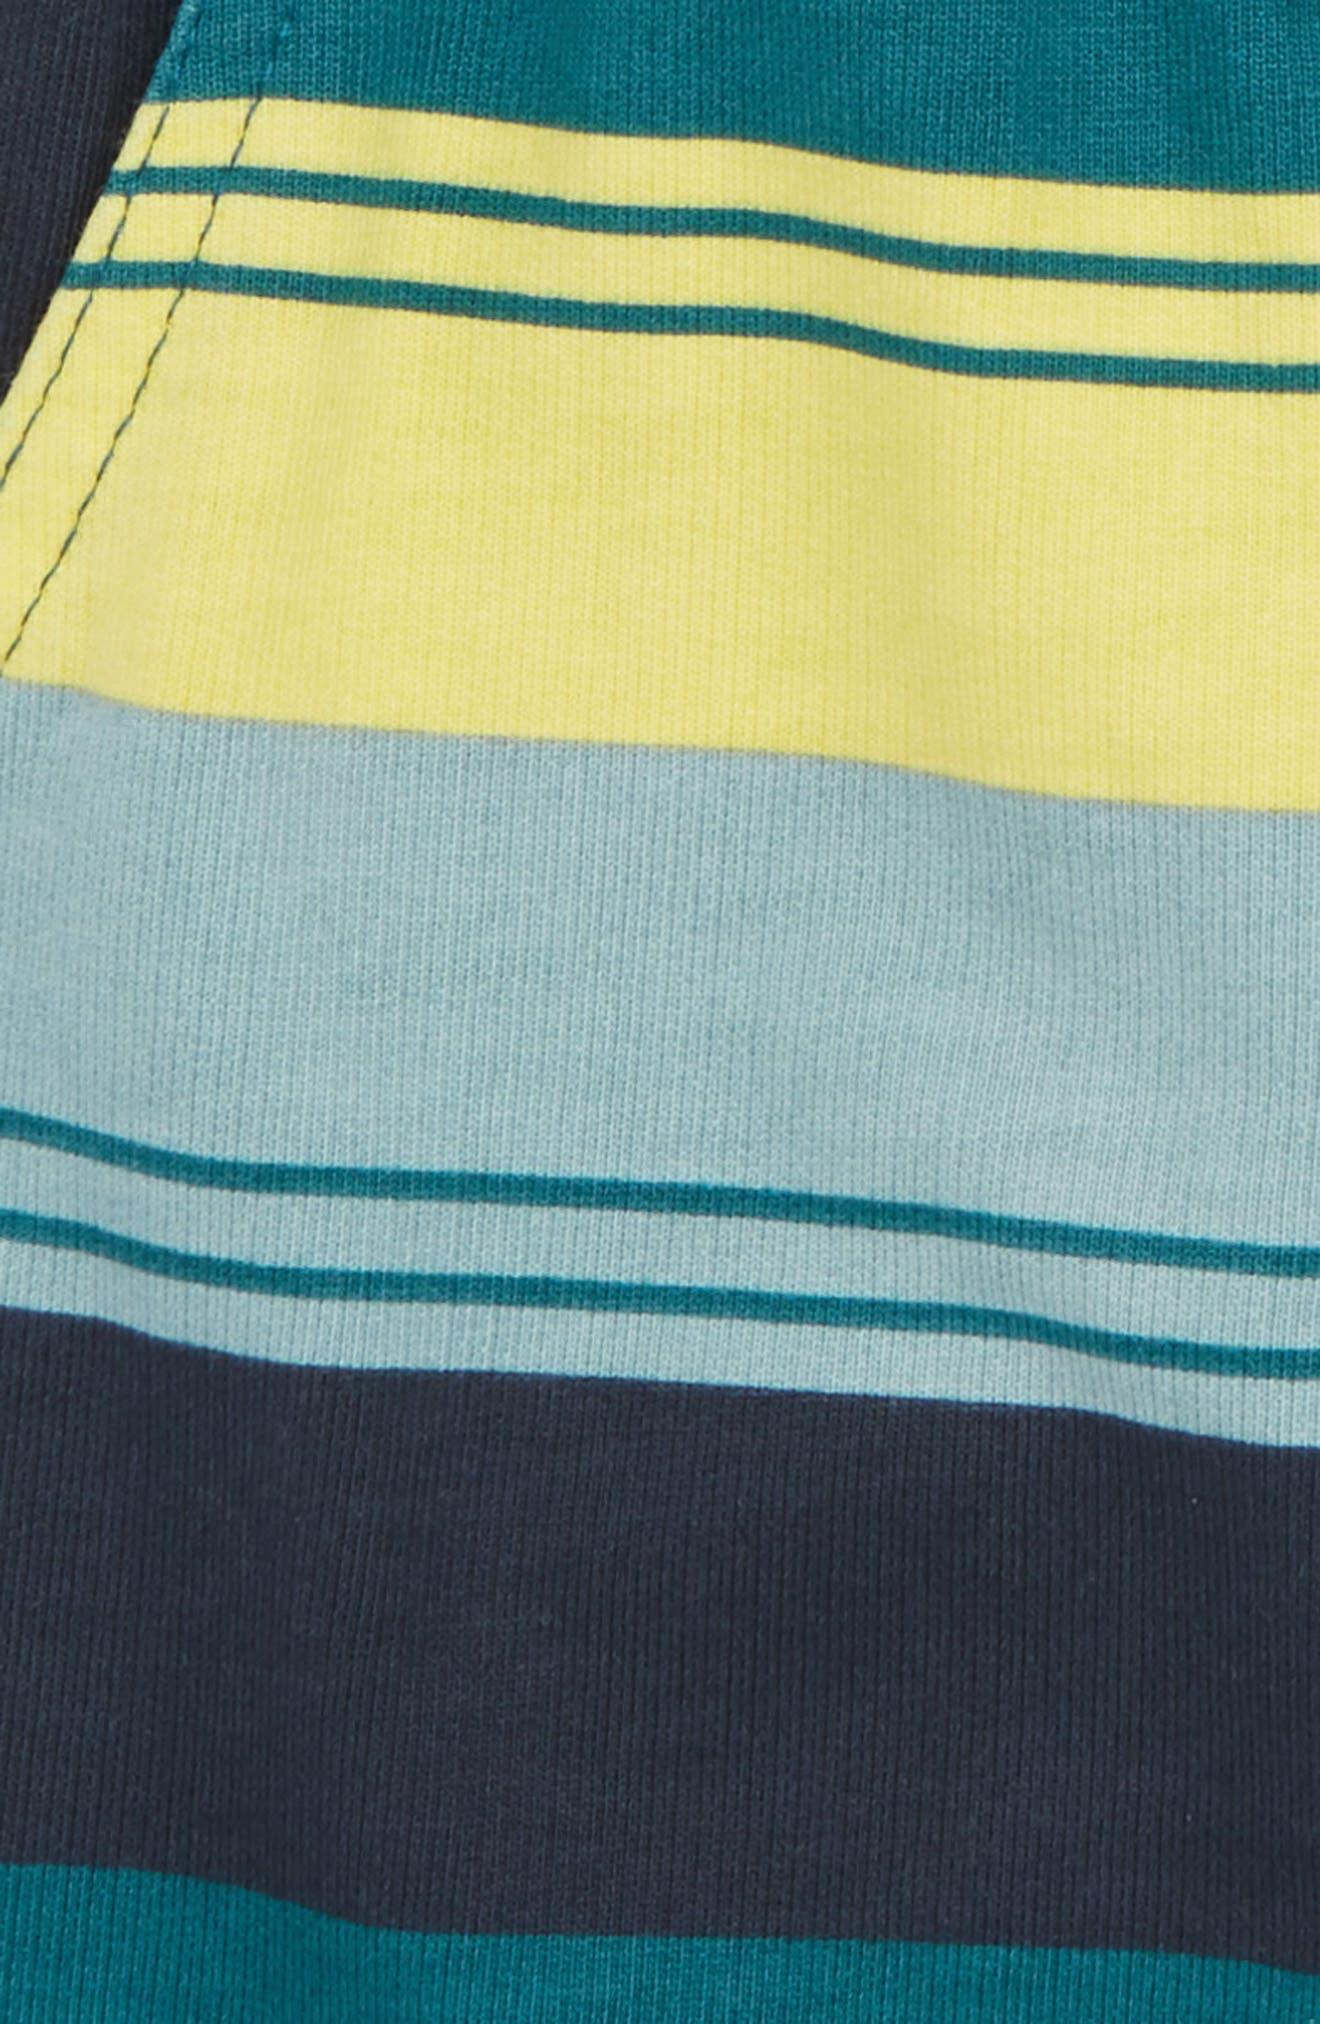 Stripe Cruiser Shorts,                             Alternate thumbnail 2, color,                             Indigo Tri-Stripe